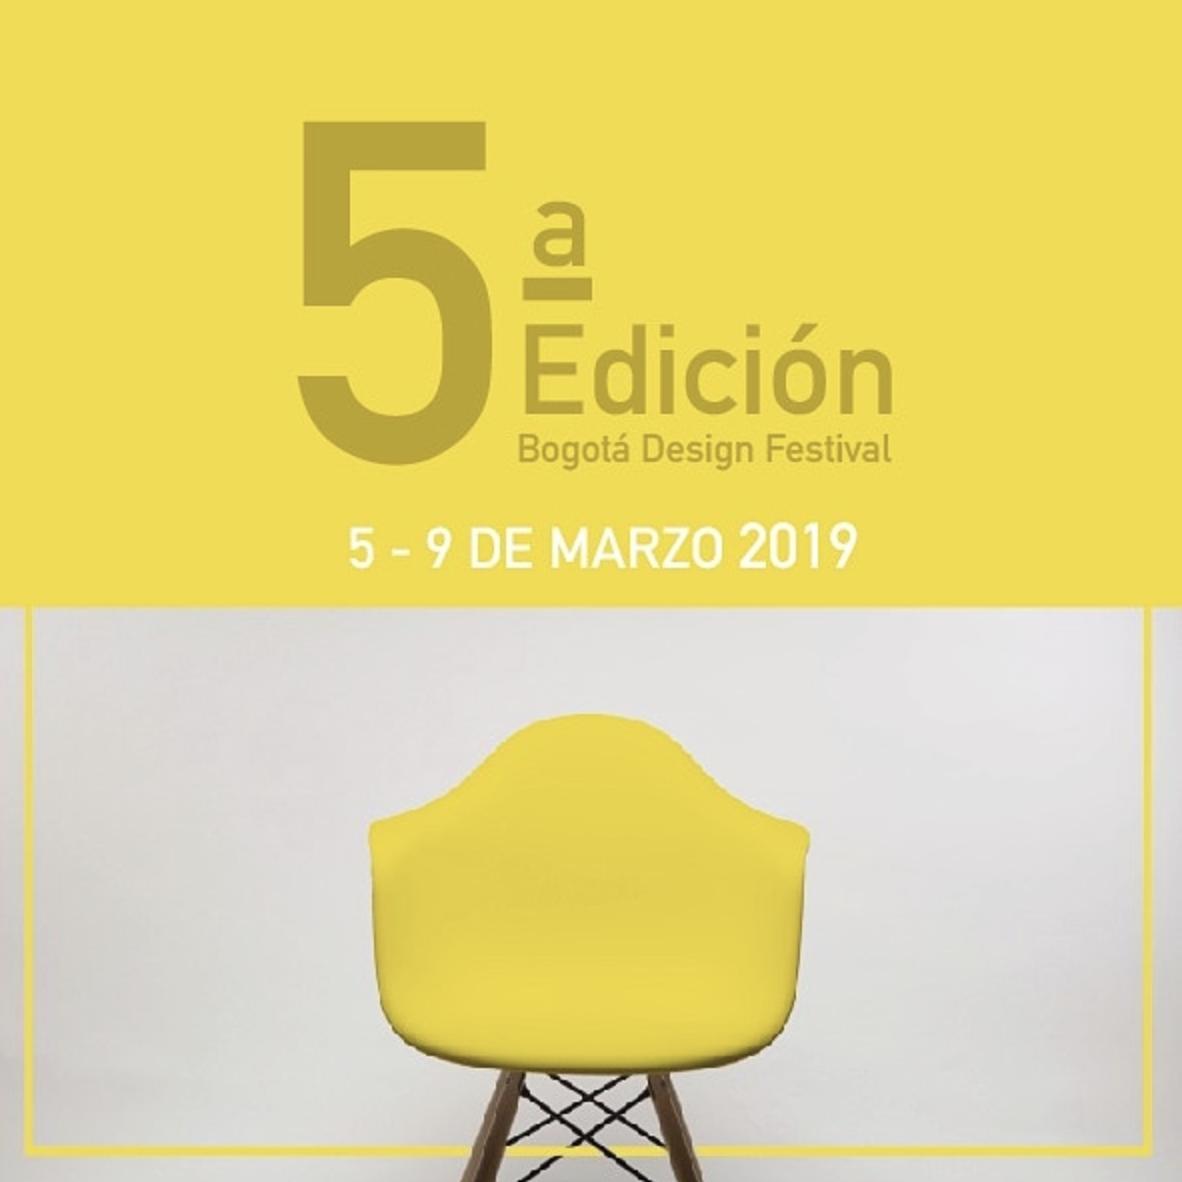 bogota design festival 2019